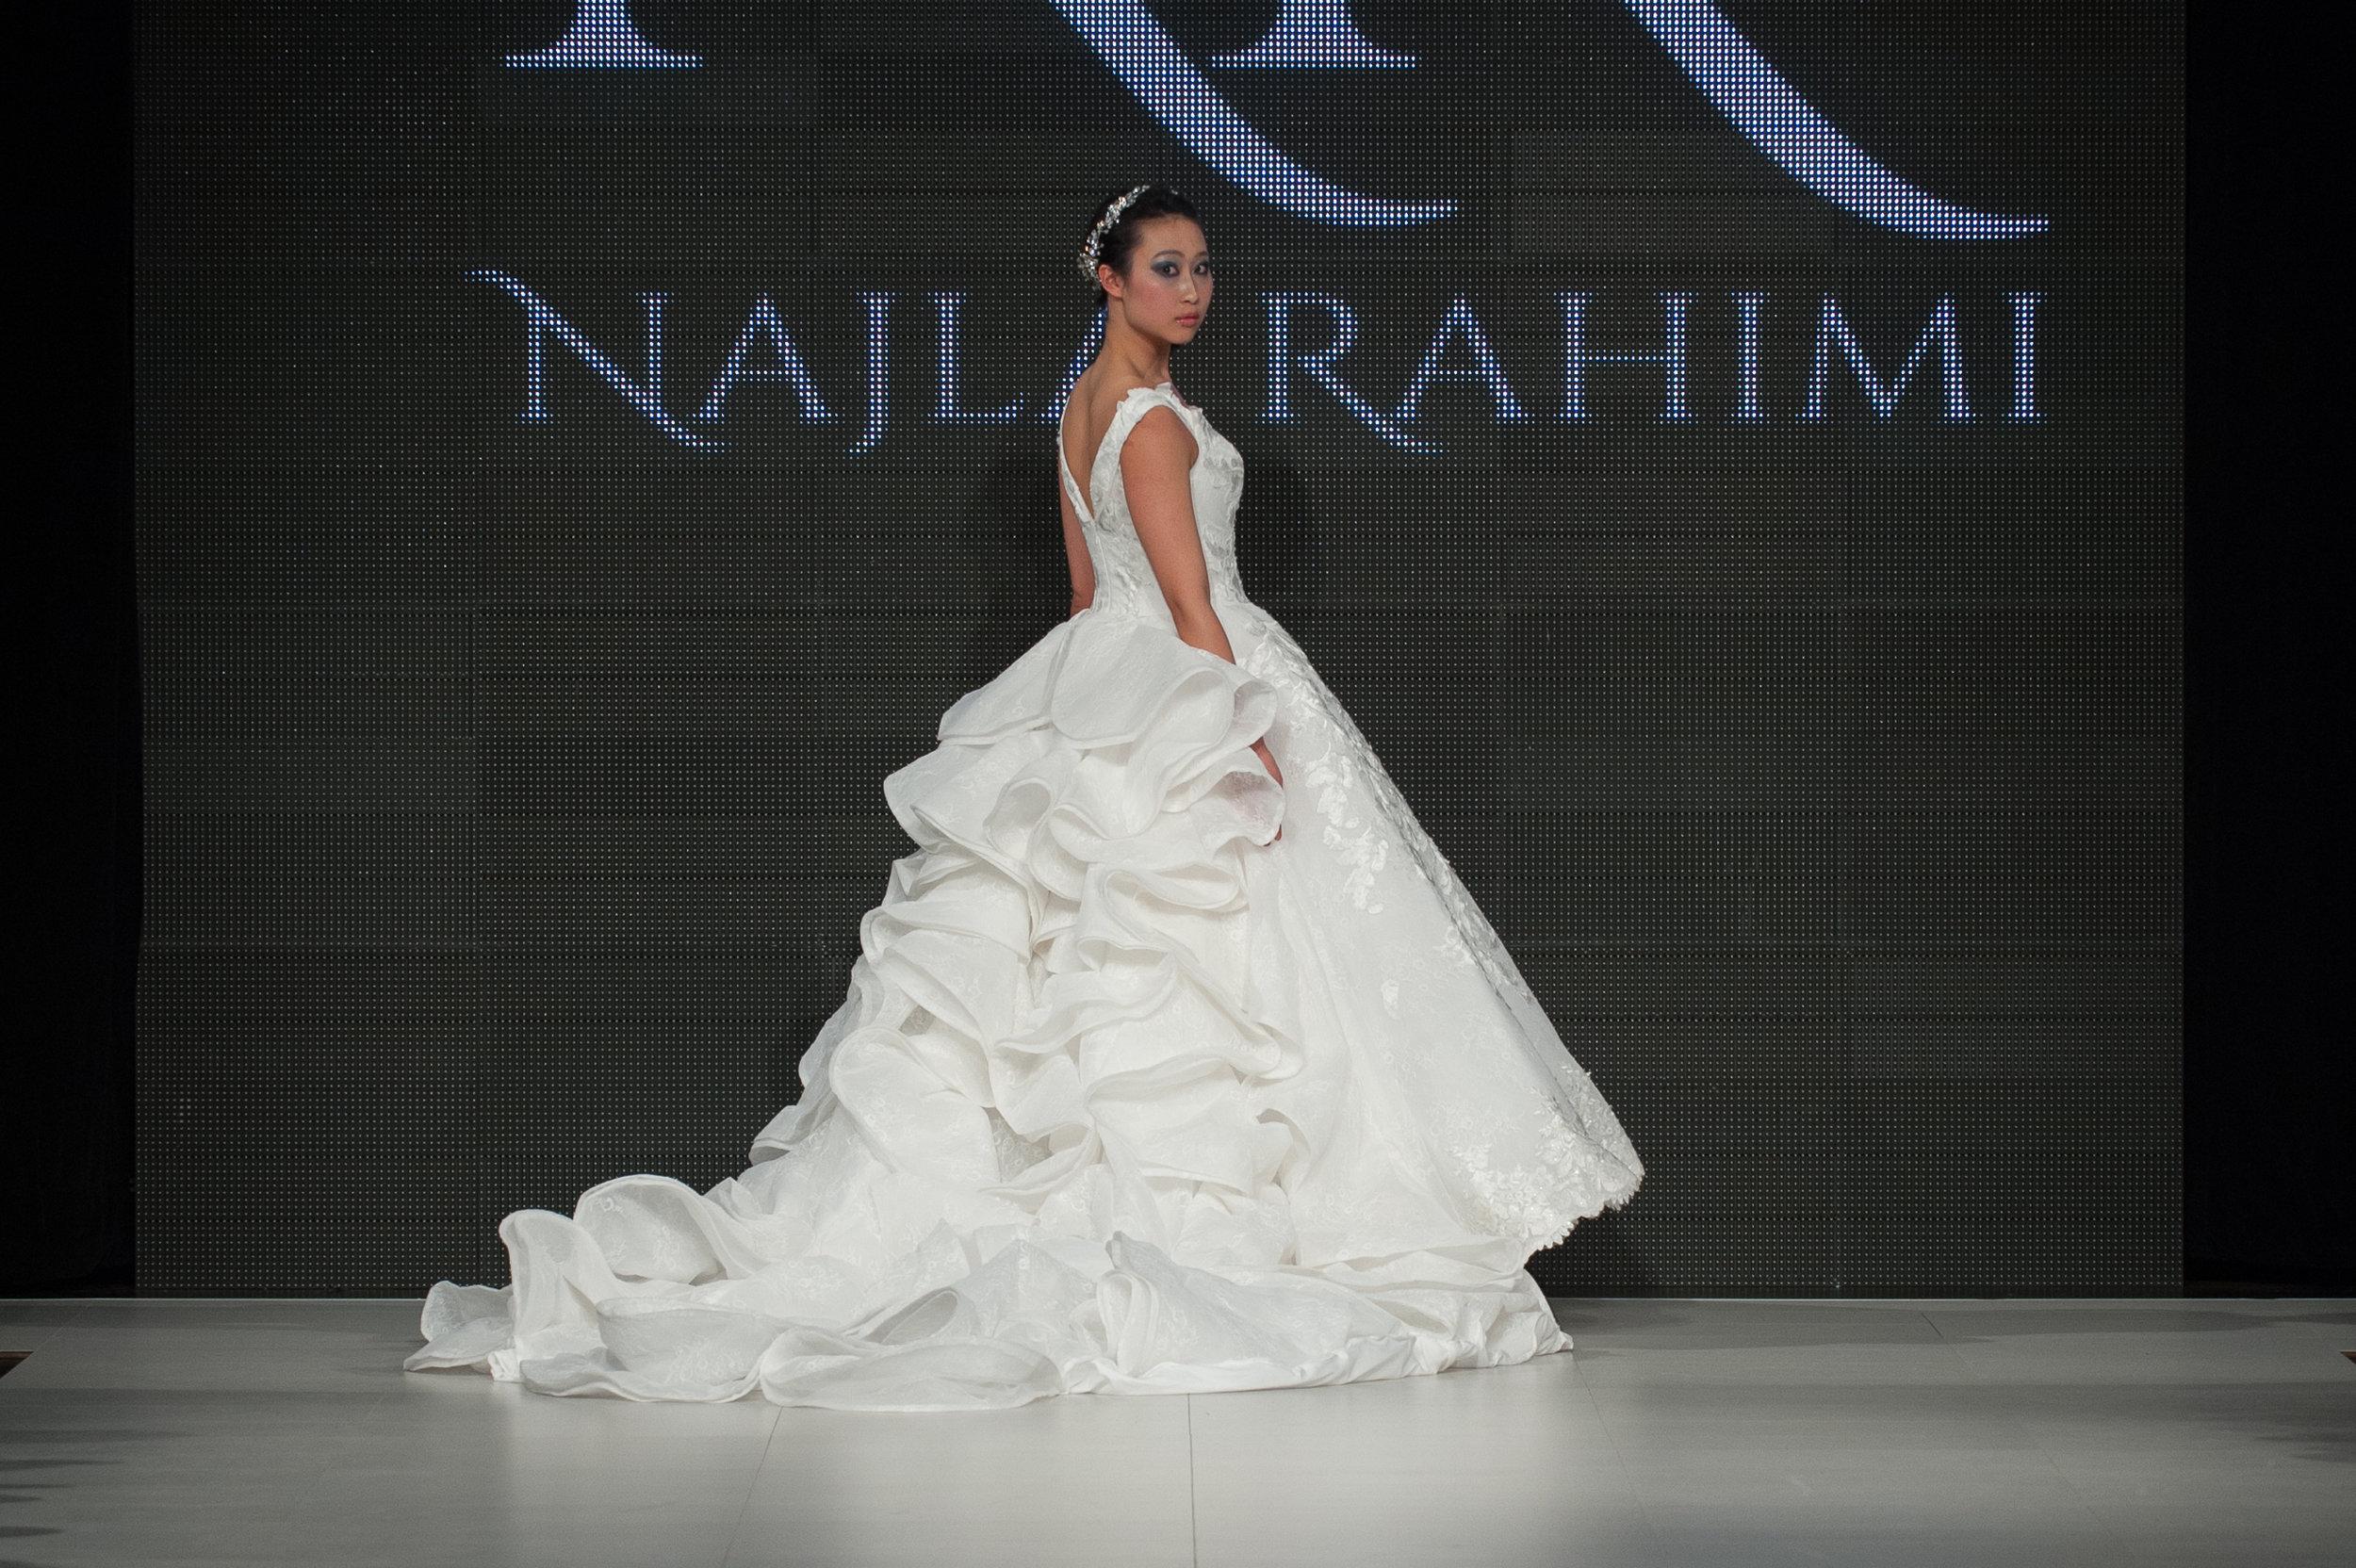 FAT2018-Day1-April17-Najla_Rahimi-Runway-Che_Rosales-LARAWAN-6202.jpg